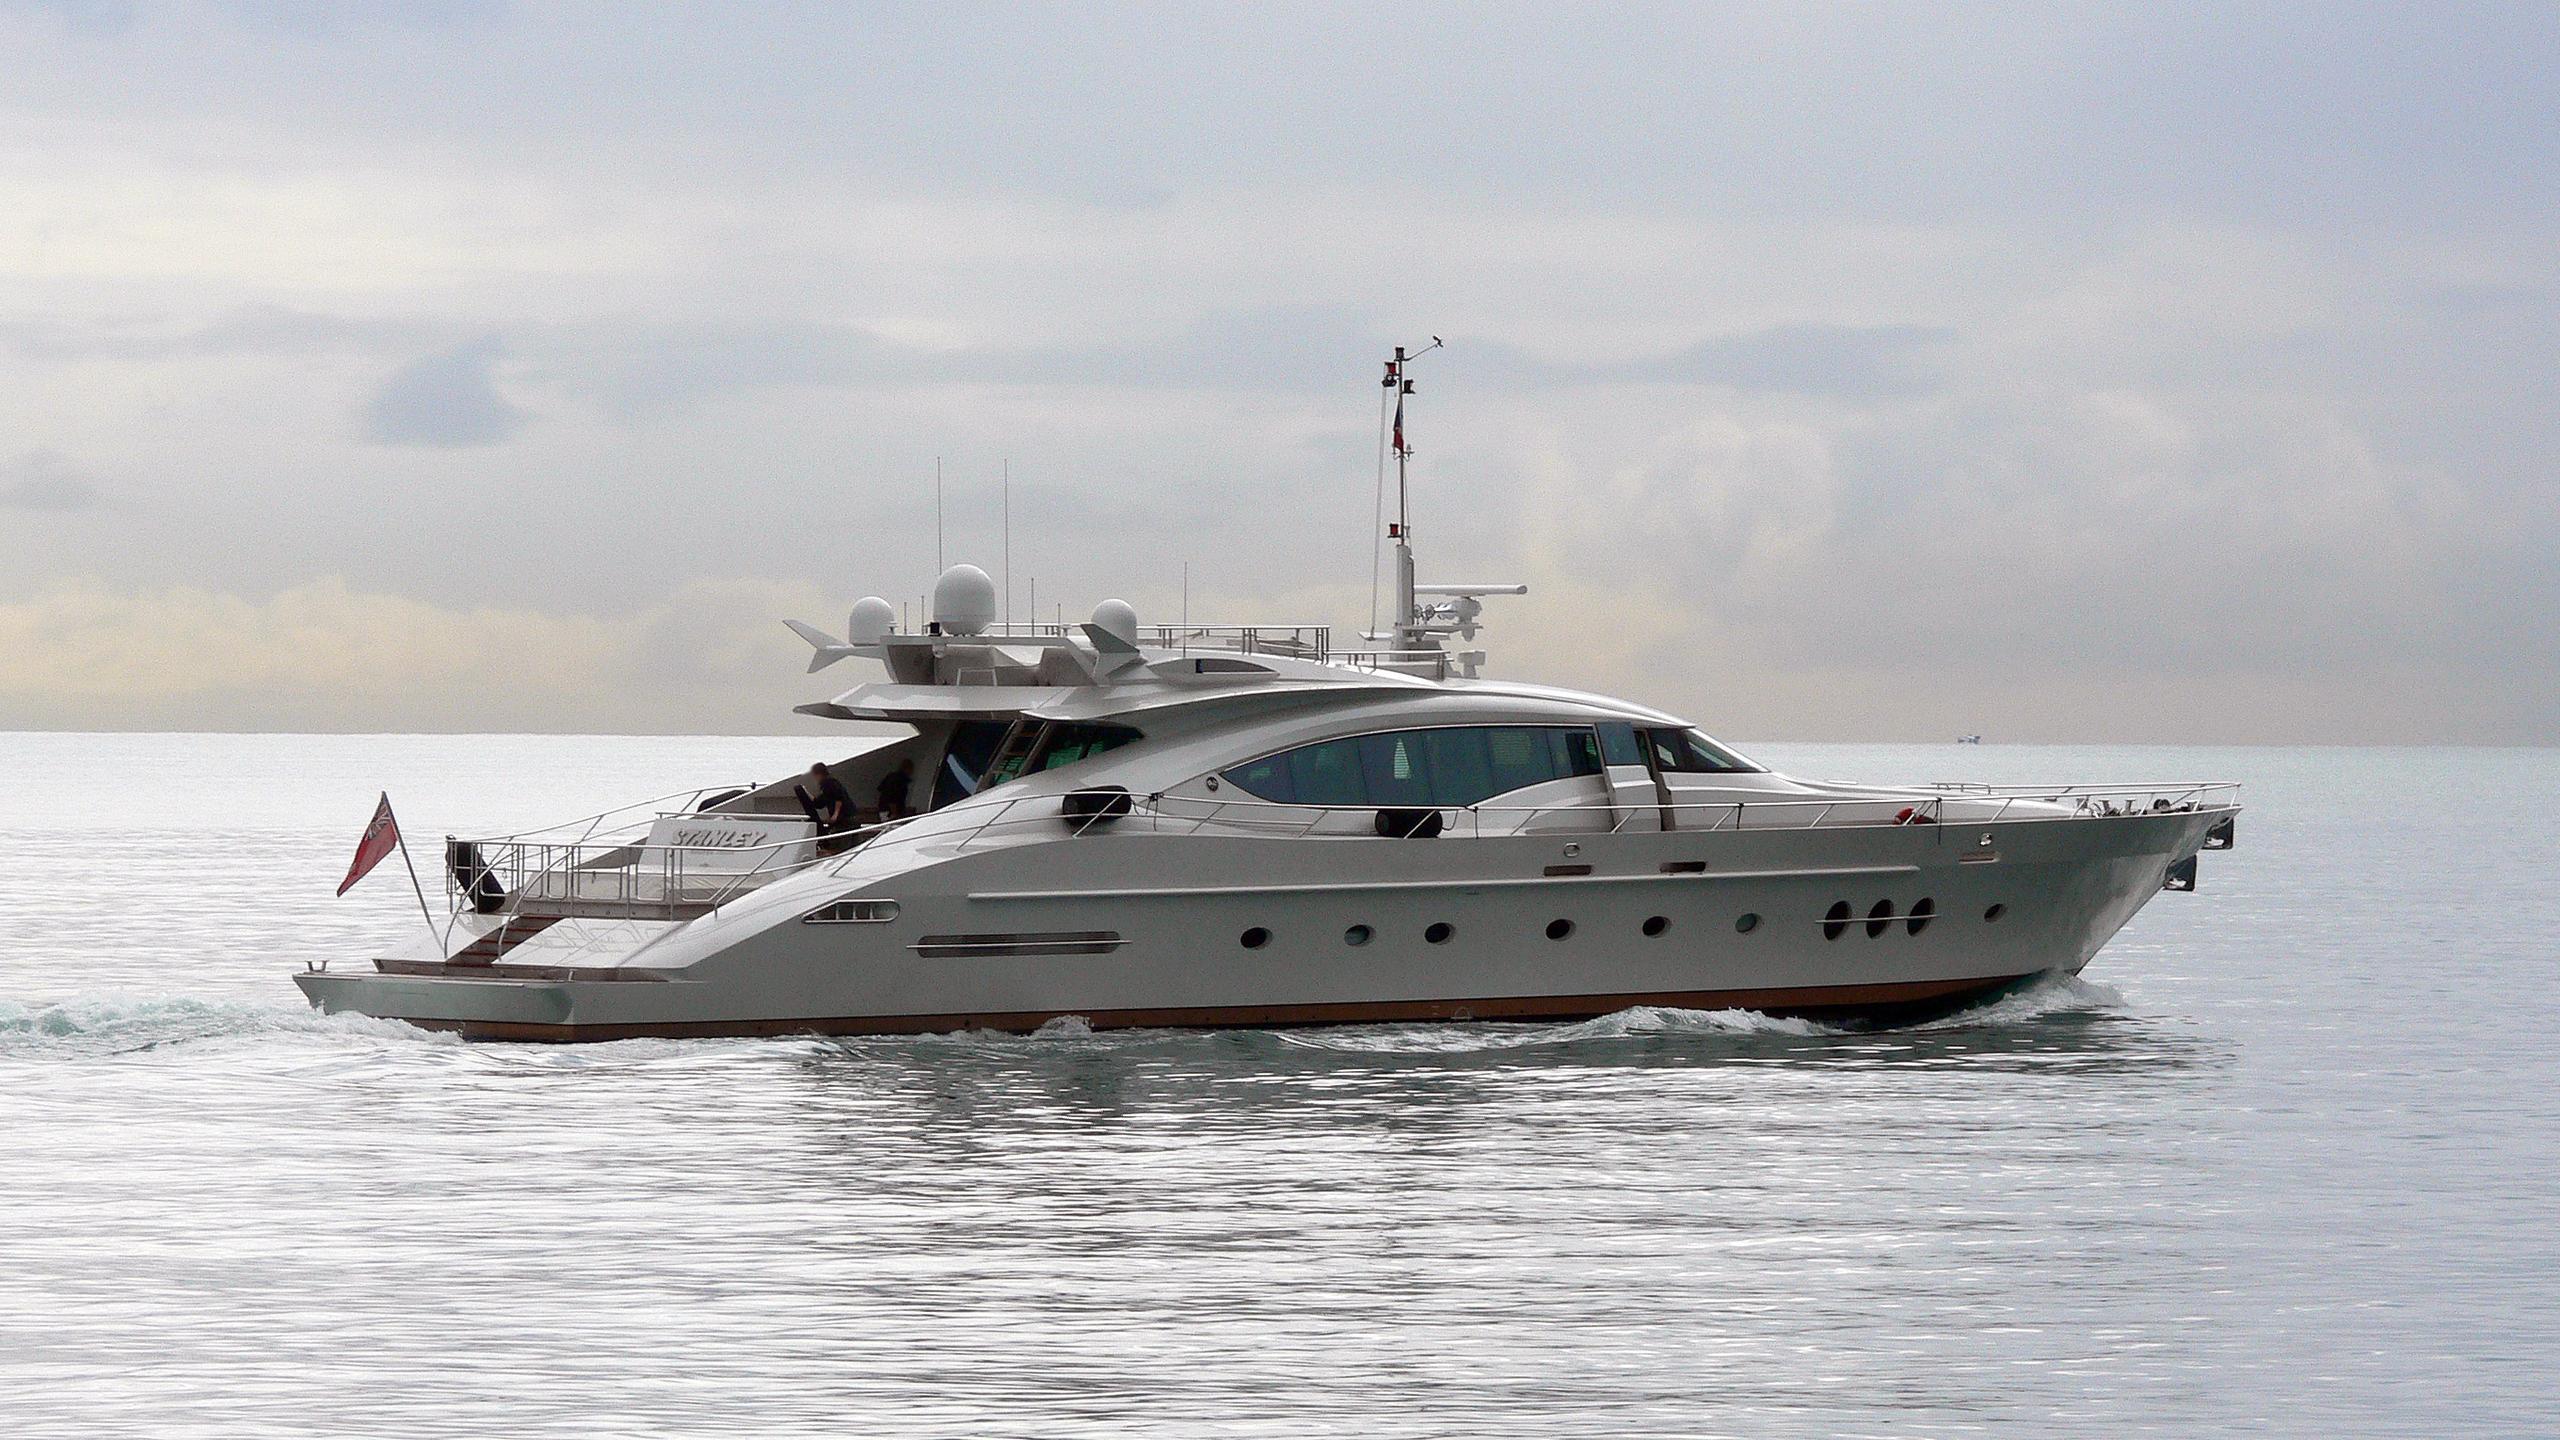 escape-ii-motor-yacht-palmer-johnson-120-2005-37m-running-half-profile